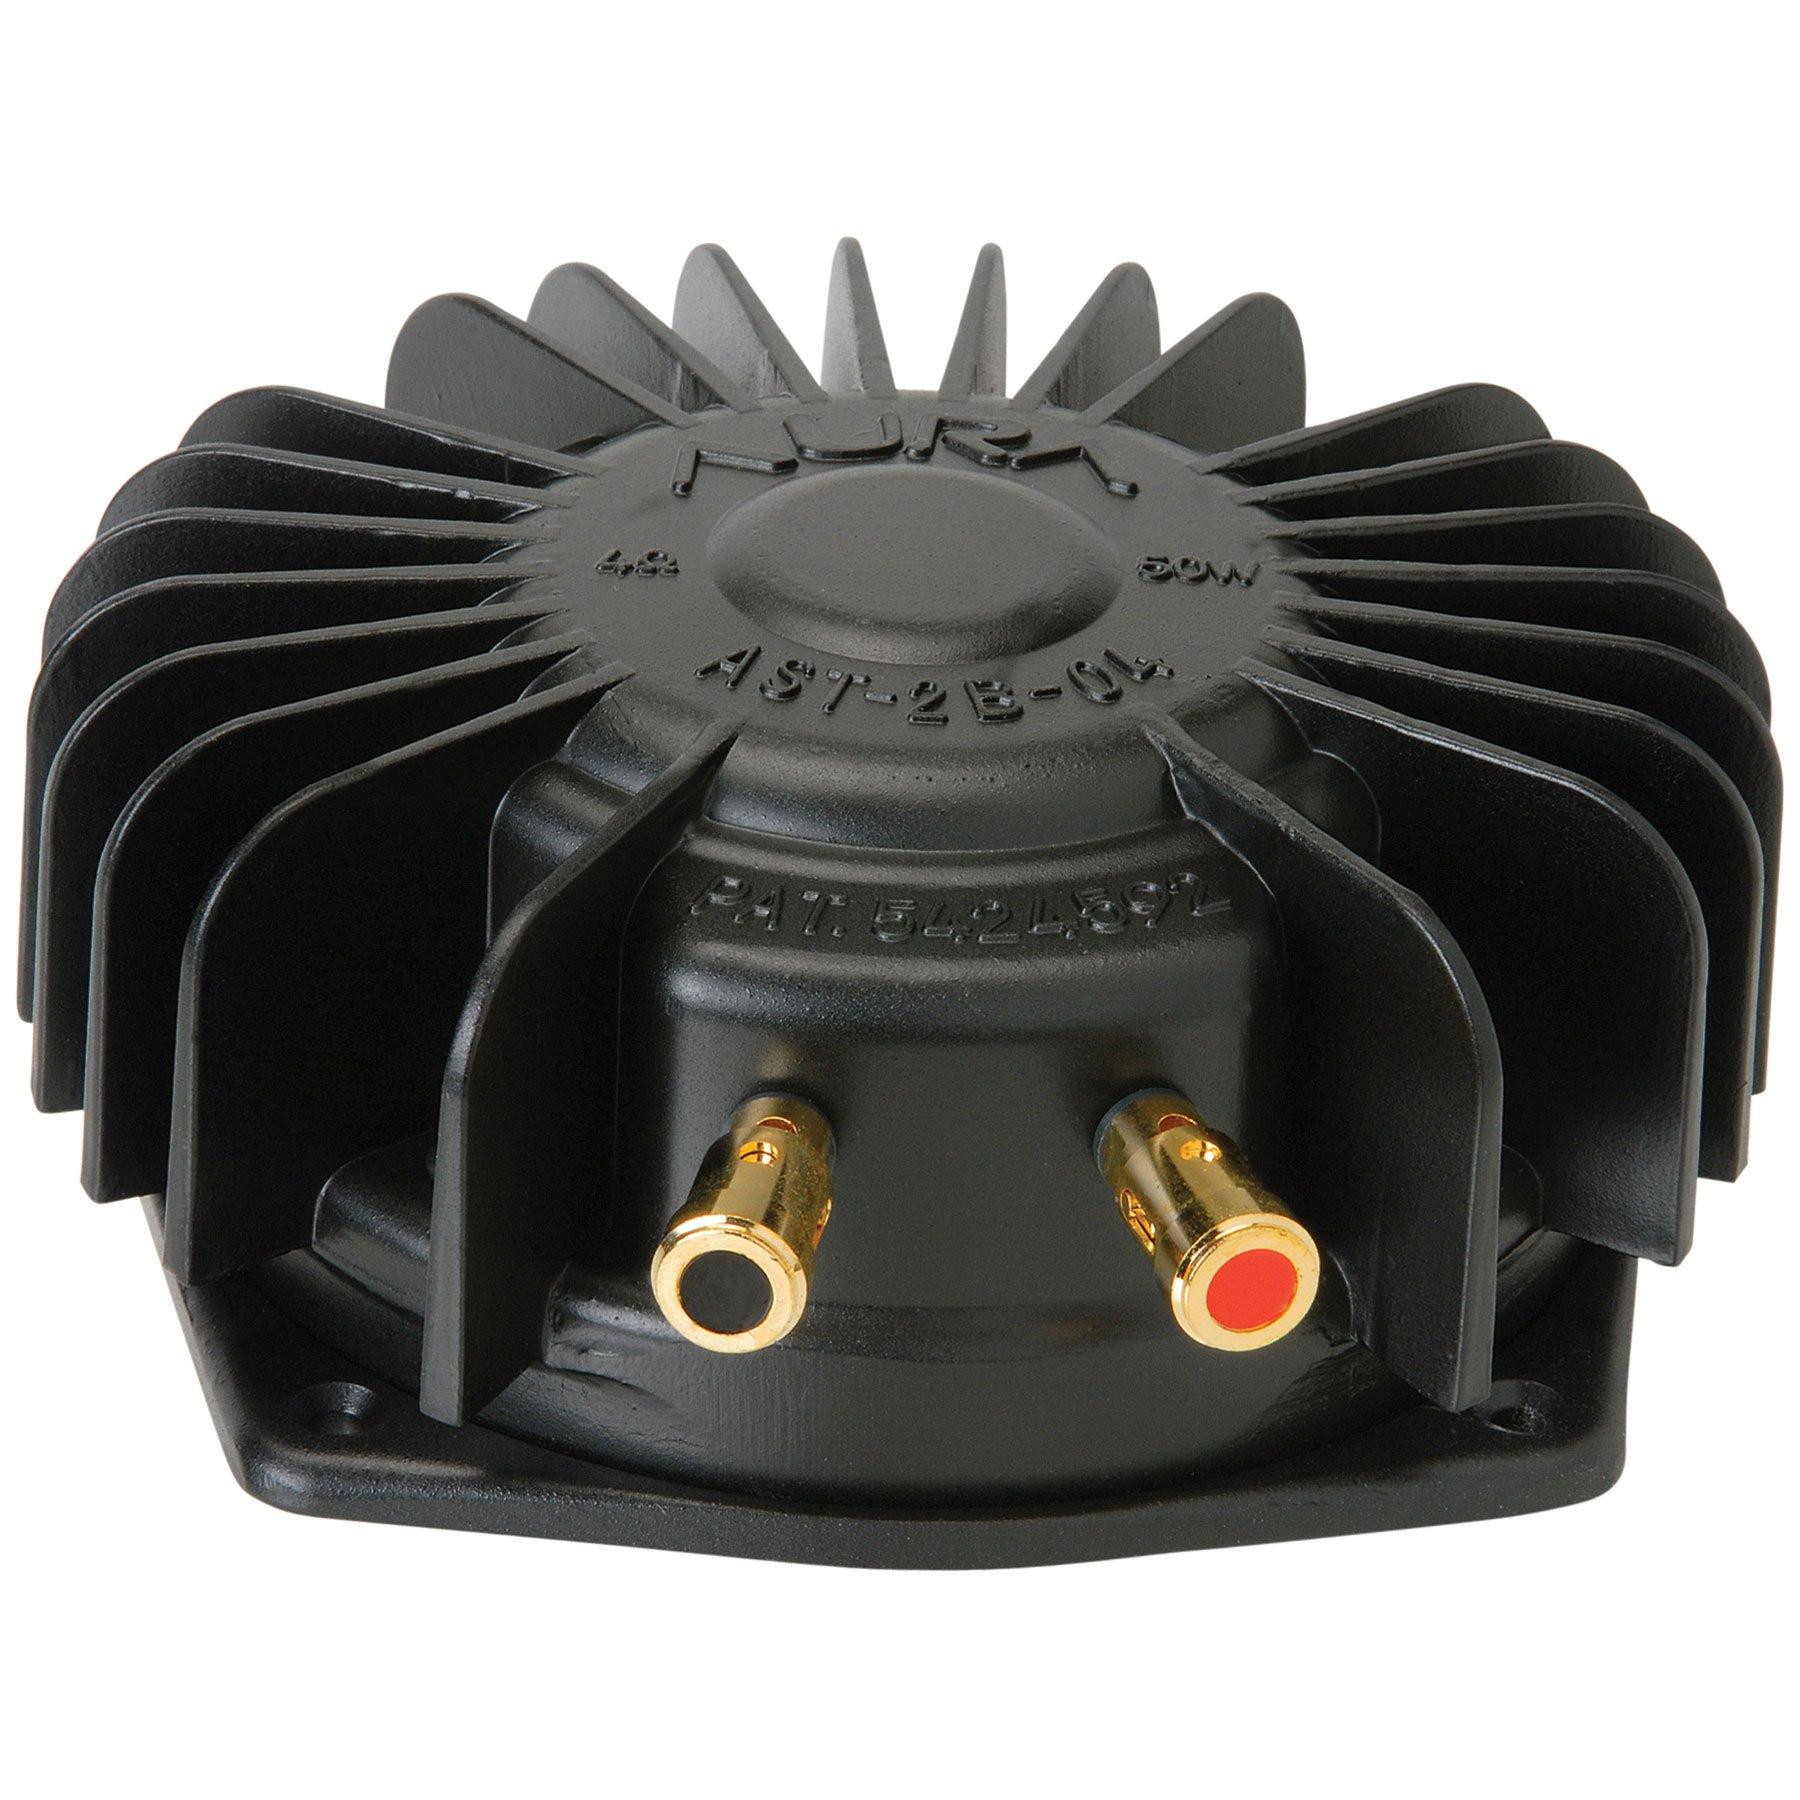 AuraSound AST-2B-4 Pro Bass Shaker Tactile Transducer by Aura Sound